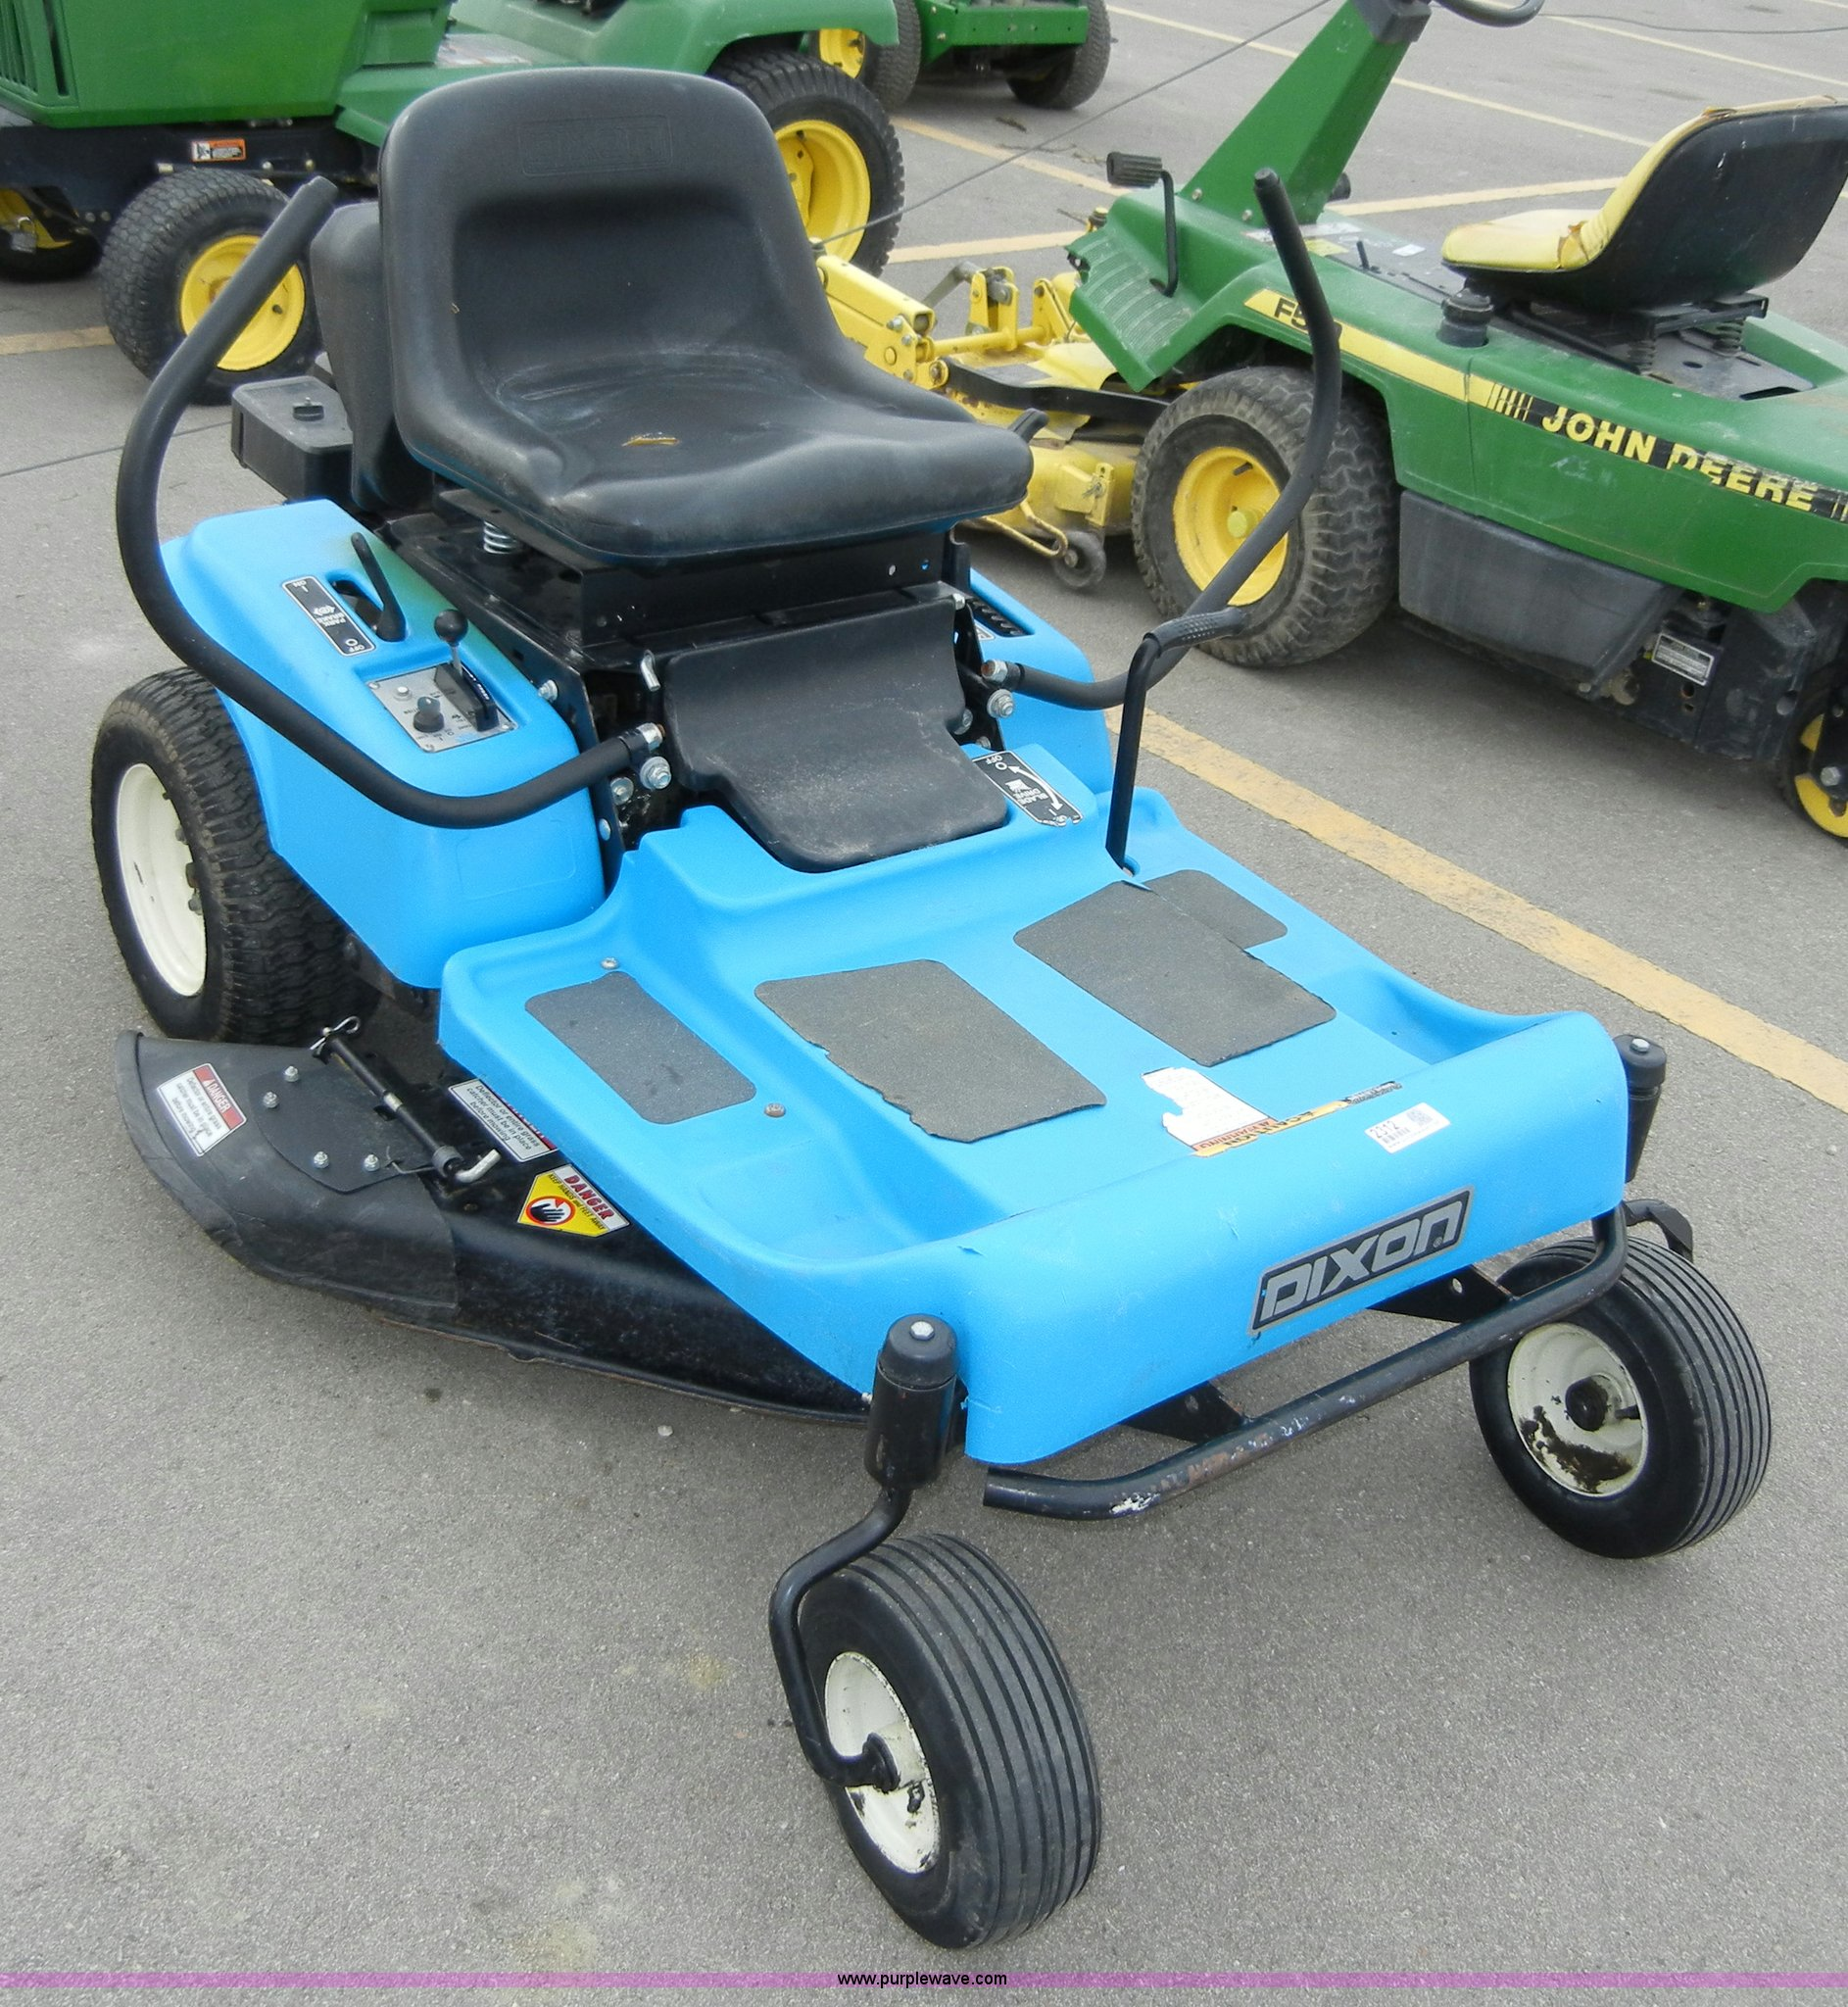 Dixon 3304 zero-turn lawnmower in Manhattan, KS | Item 2312 sold | Purple  Wave